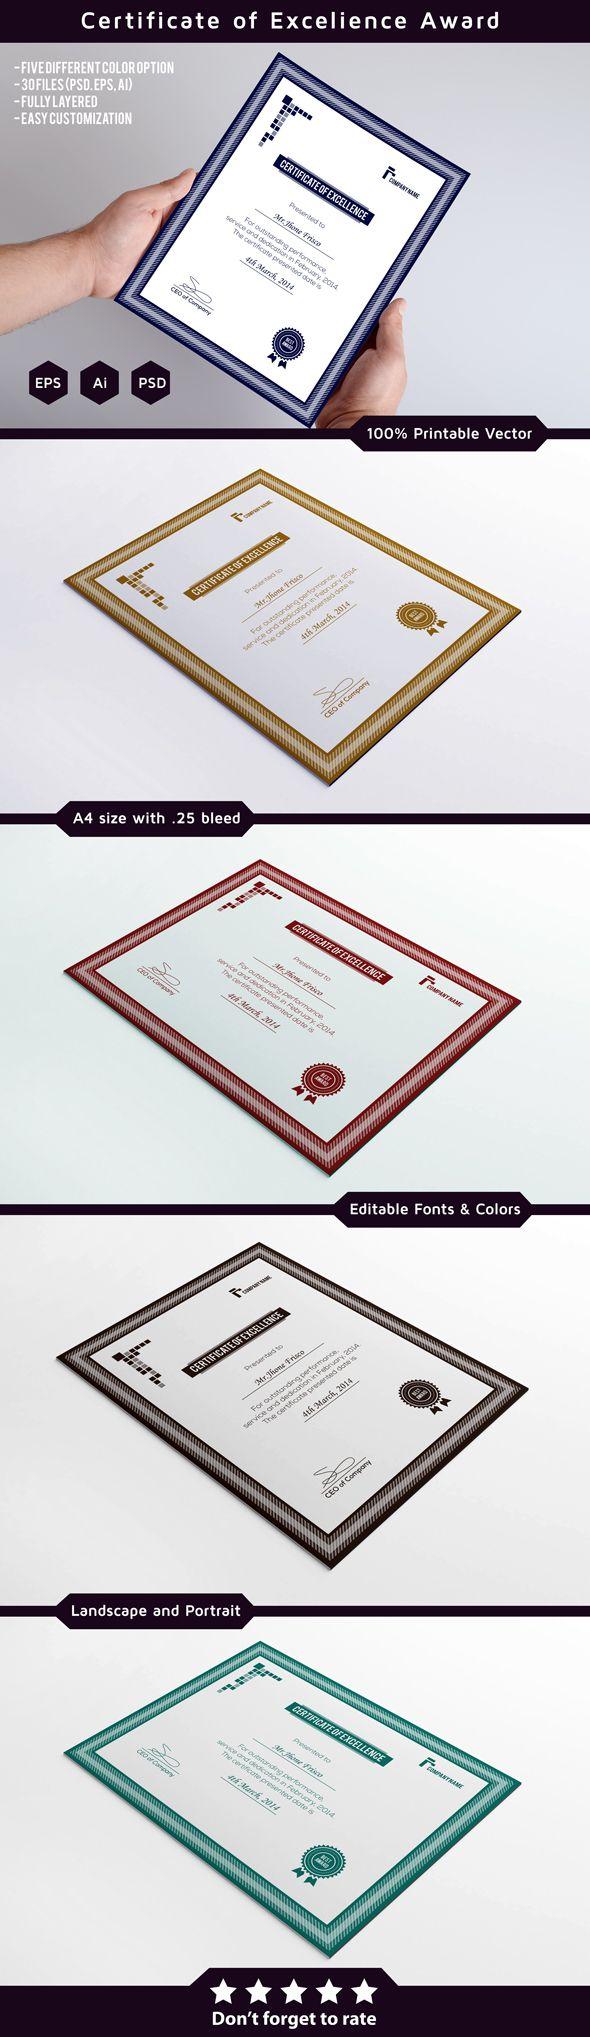 Award Certificate Template on Behance